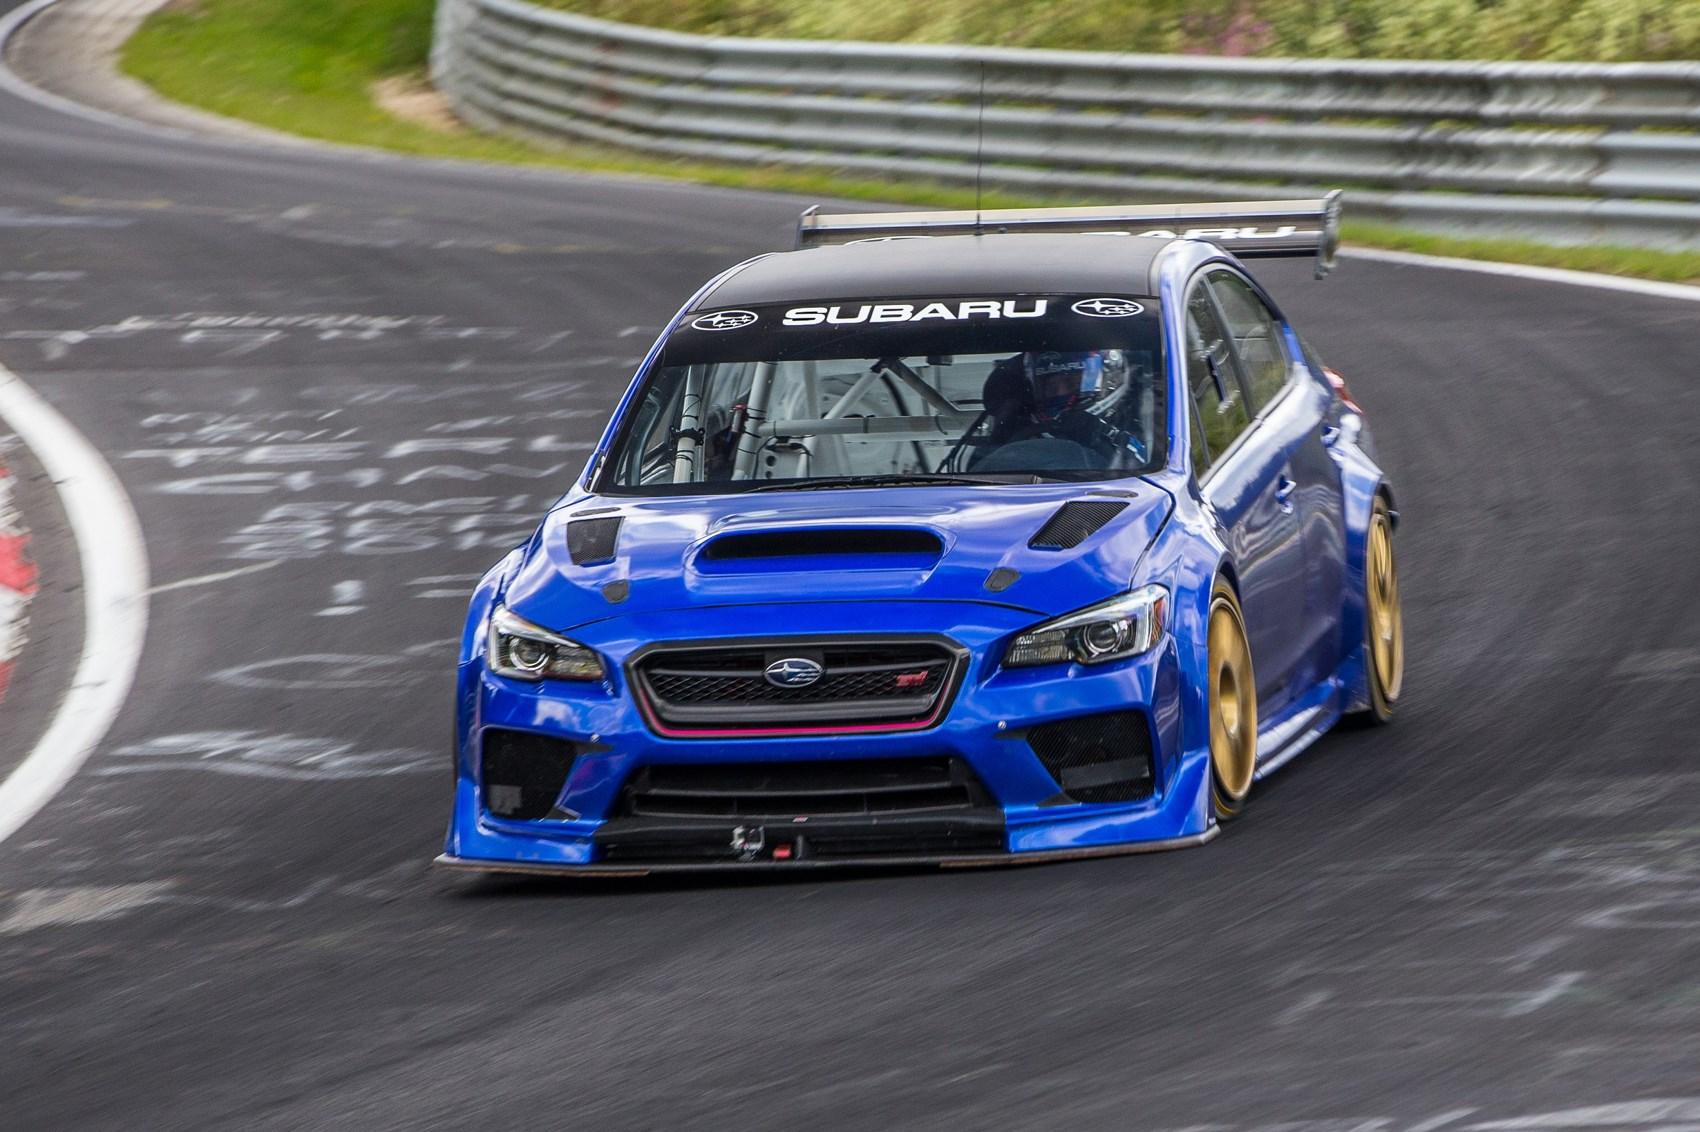 Sti Type Ra >> Subaru Wrx Sti Type Ra Nbr Special Thrashes Ring Record